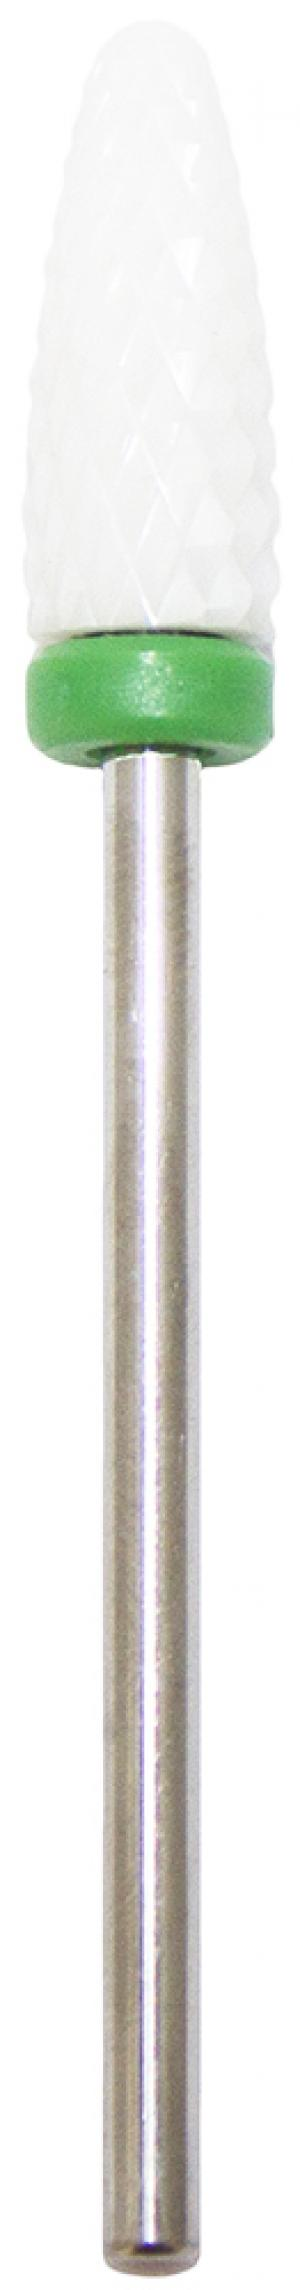 Насадка к фрезеру ANVI Professional Flame Ceramic C 3/32  - 00-00010793